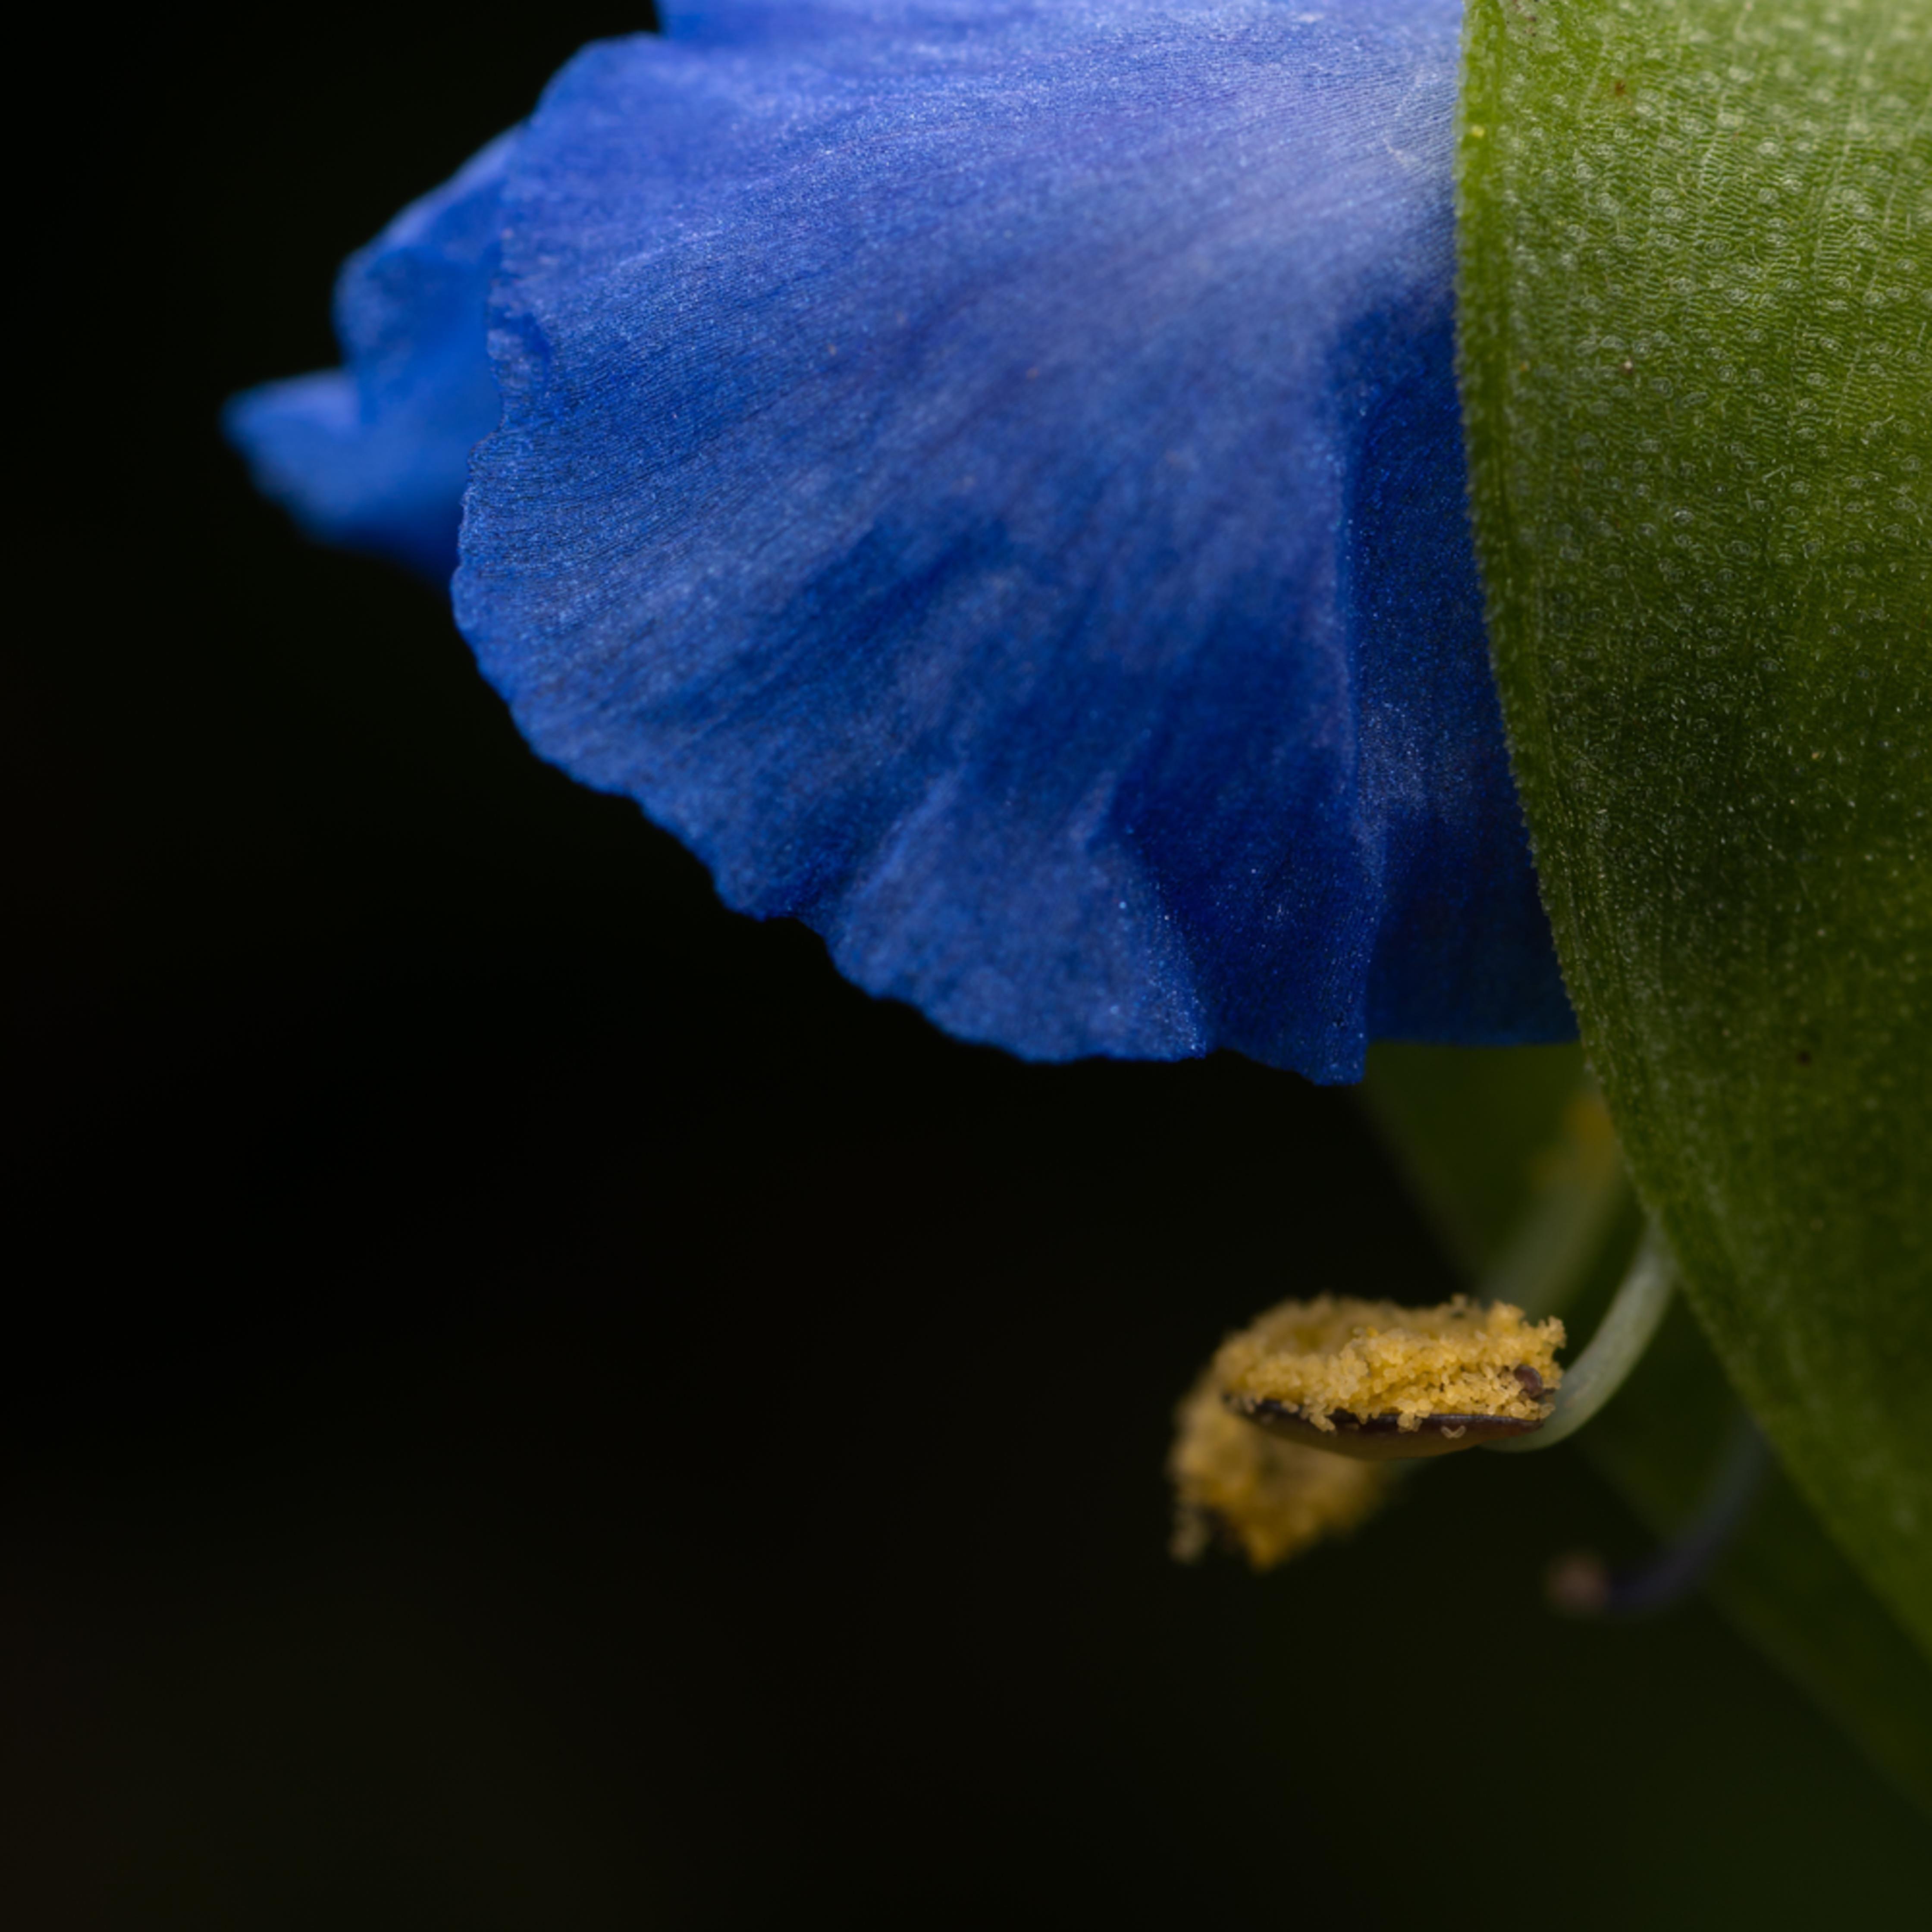 Asiatic dayflower e33526 rv5thb